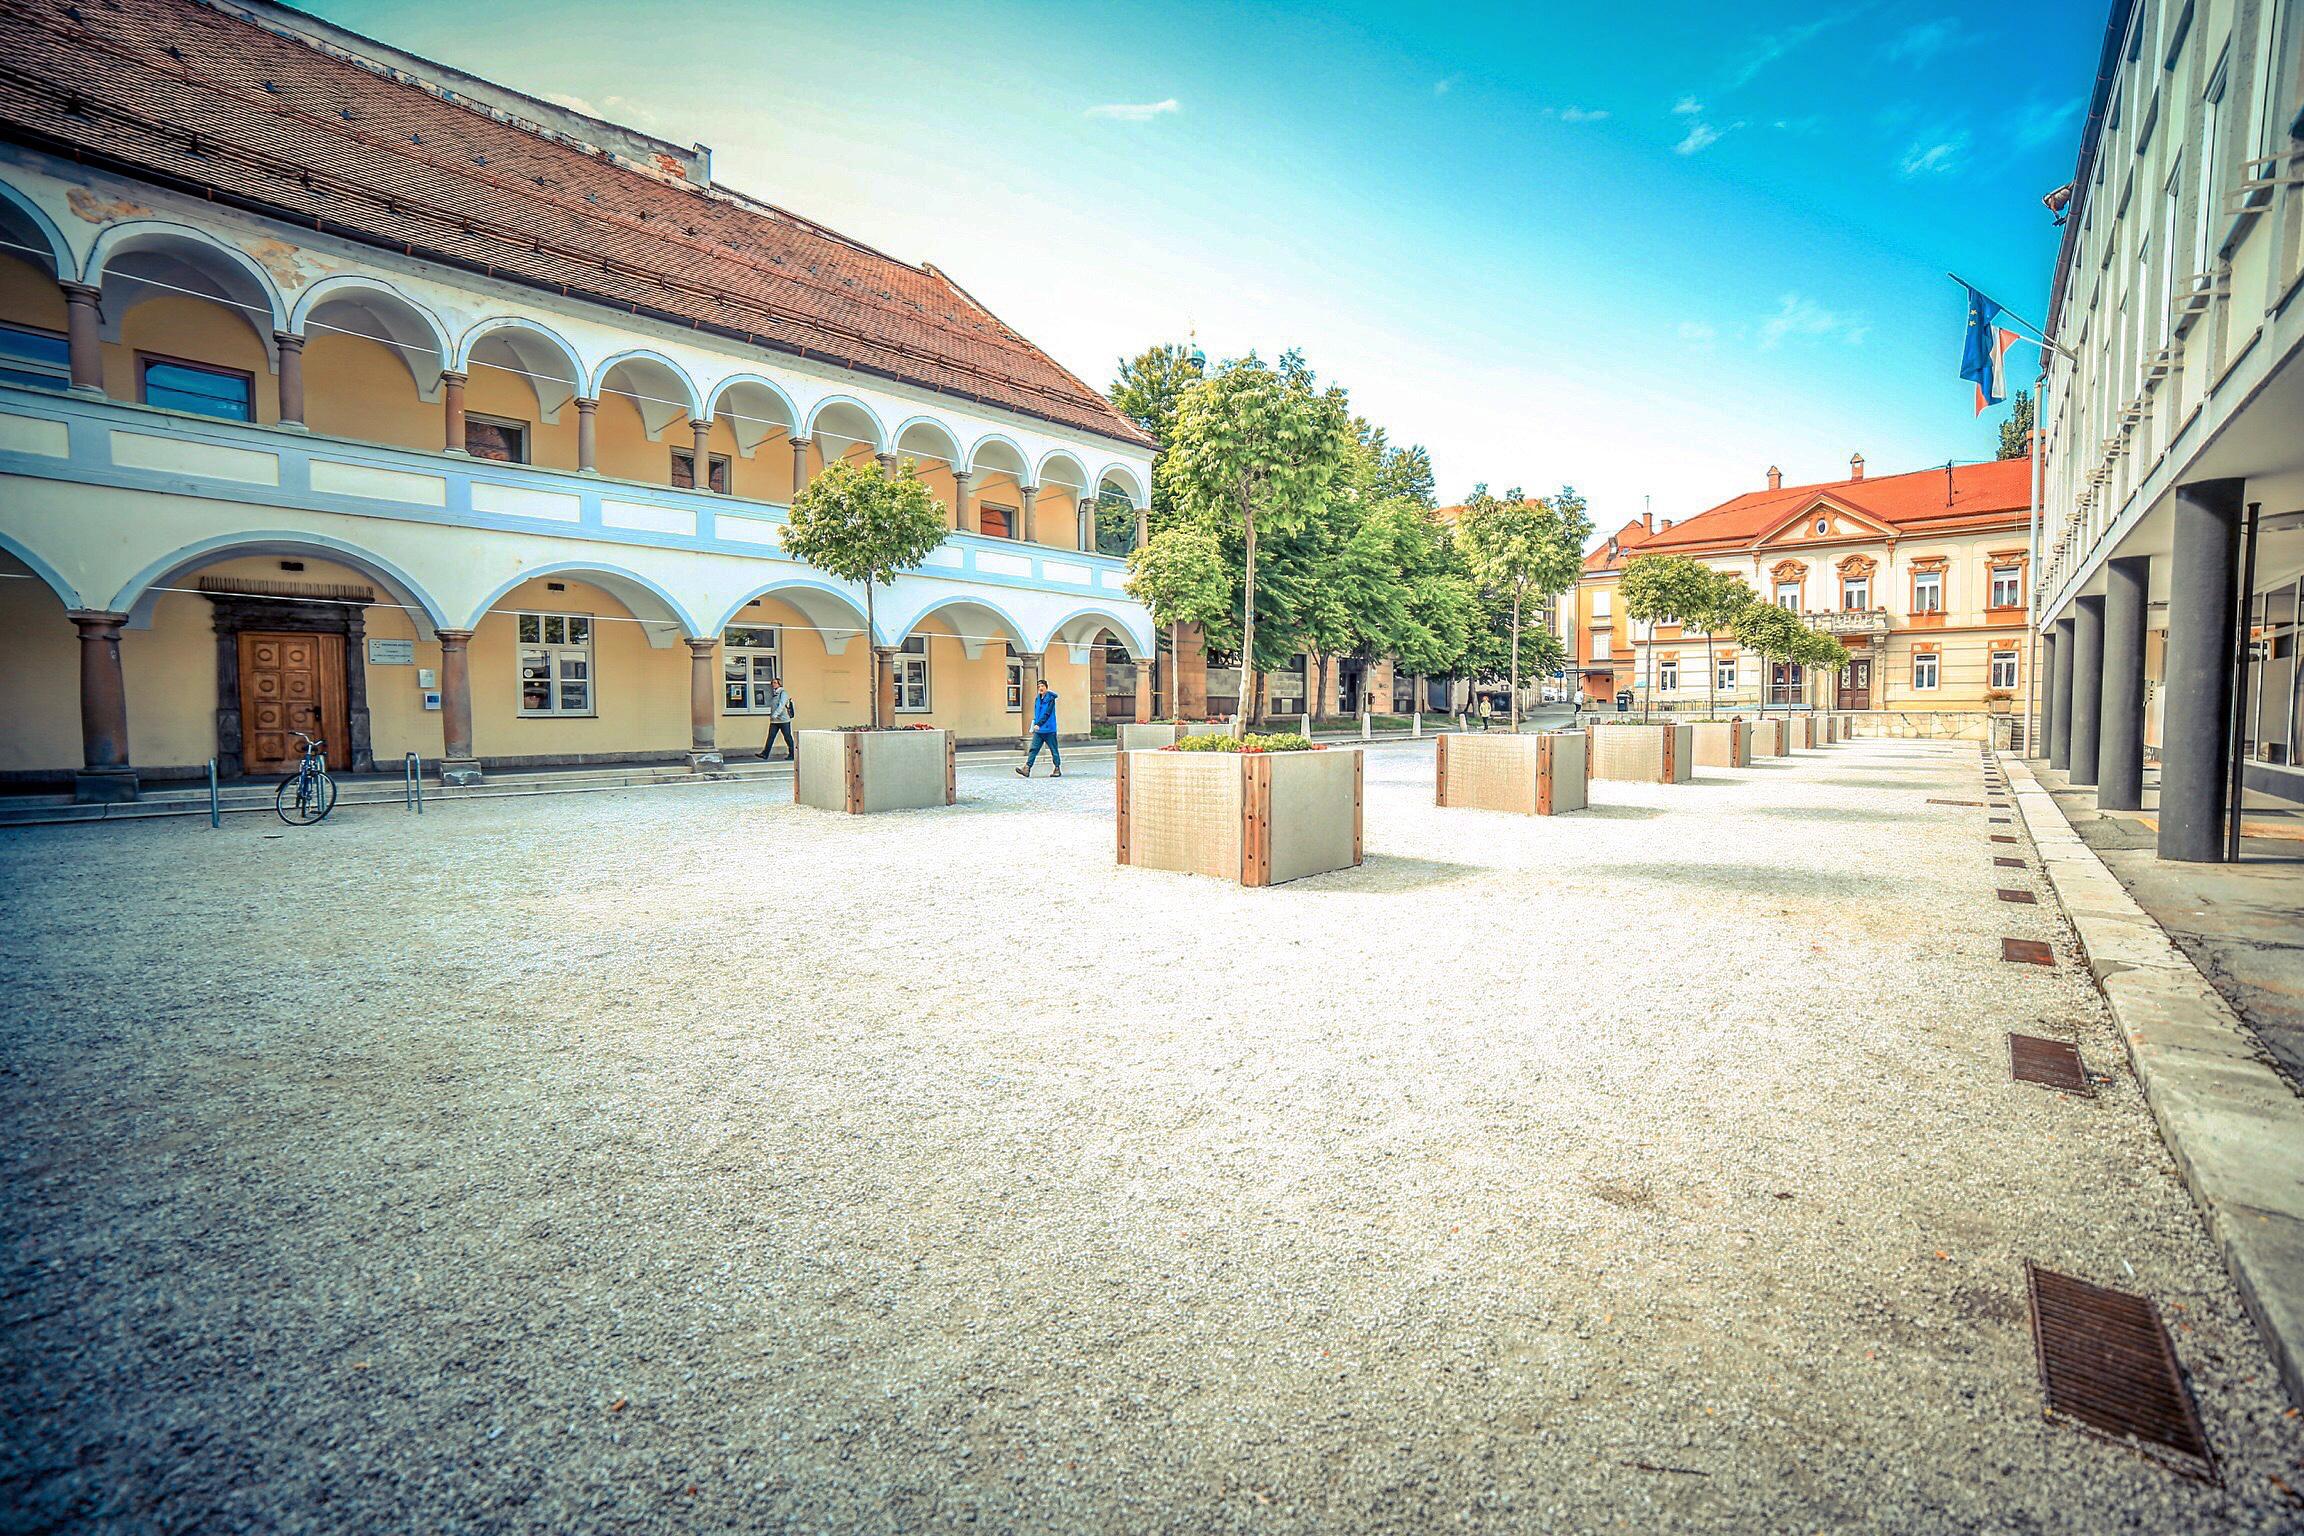 Pomladni_Maribor-13.jpg